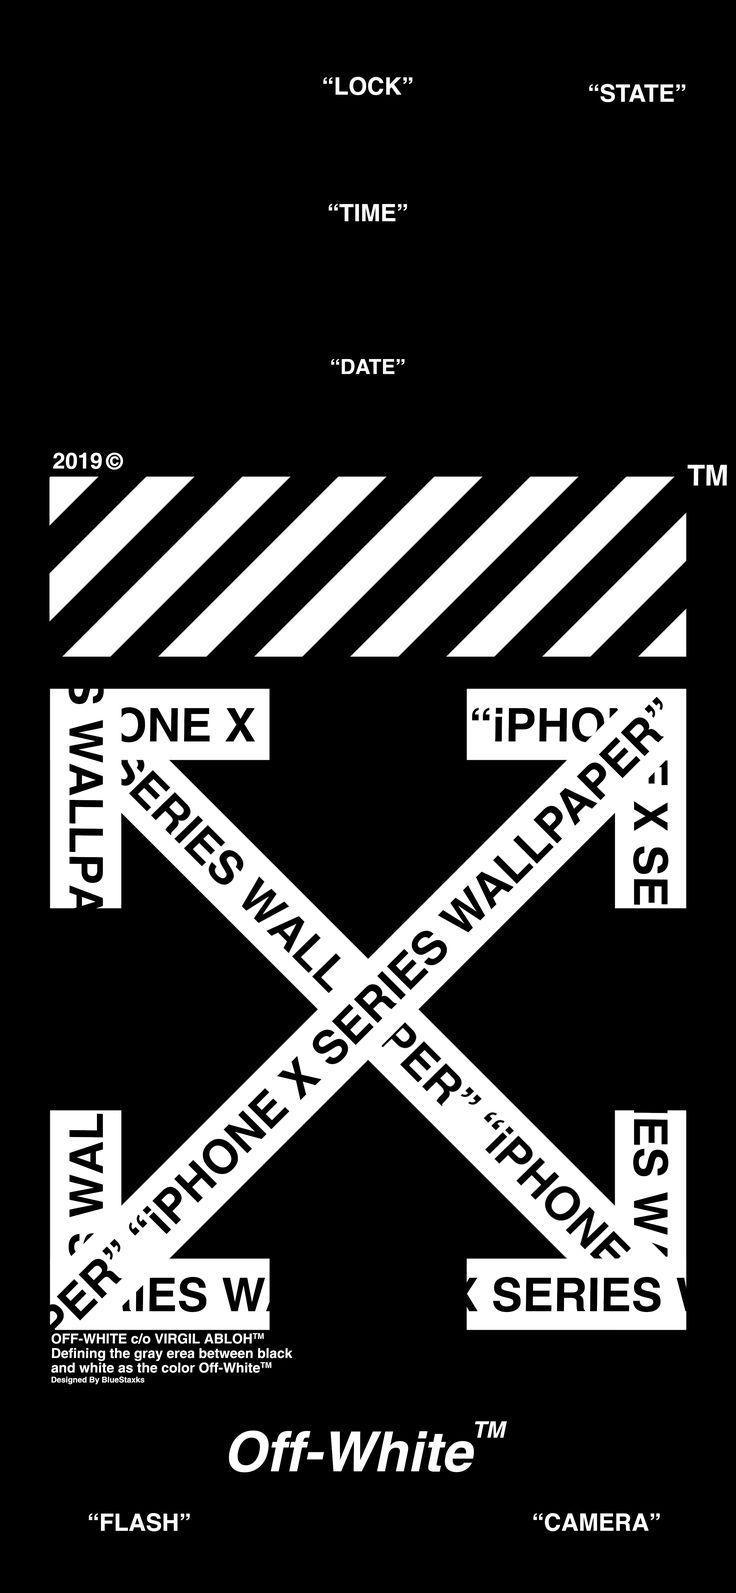 Ios 13 Wallpaper Iphone 7 Plus Ios 13 Wallpaper Iphone Iphone Wallpaper Off White White Wallpaper For Iphone Supreme Iphone Wallpaper